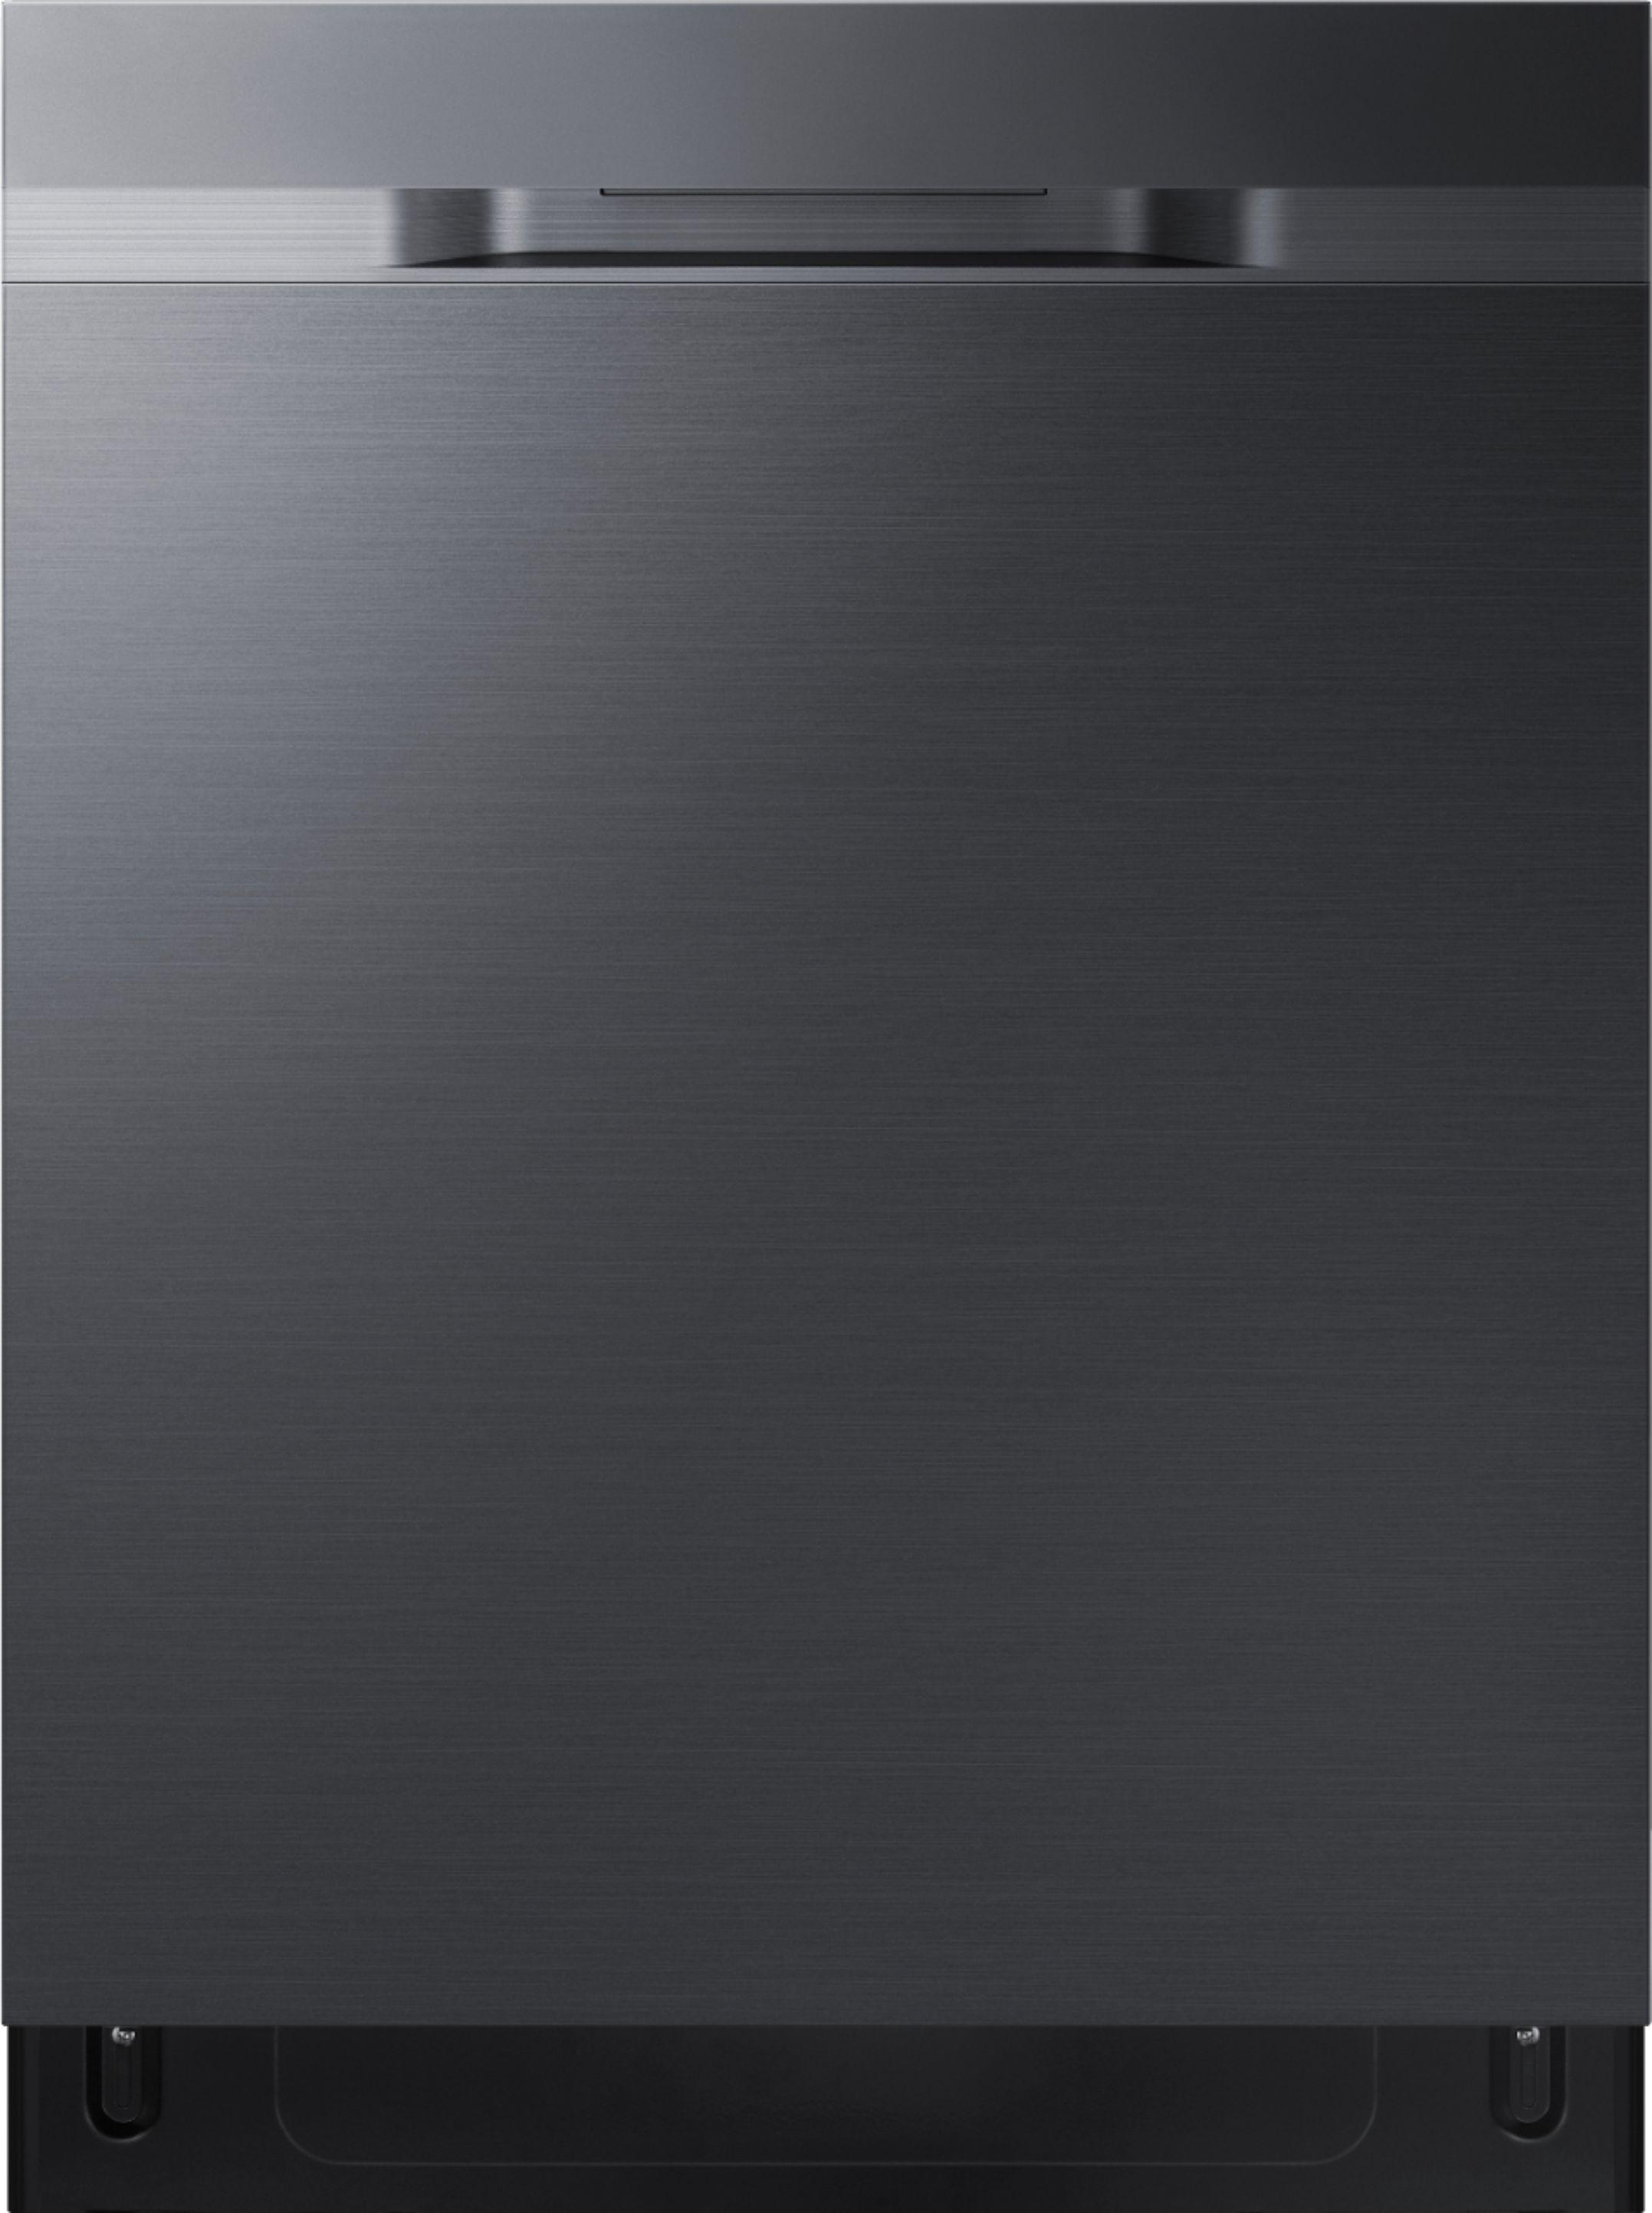 Samsung Dishwasher Kick Plate : samsung, dishwasher, plate, Samsung, StormWash™, Control, Built-In, Dishwasher, AutoRelease, Rack,, Black, Stainless, Steel, DW80R5060UG